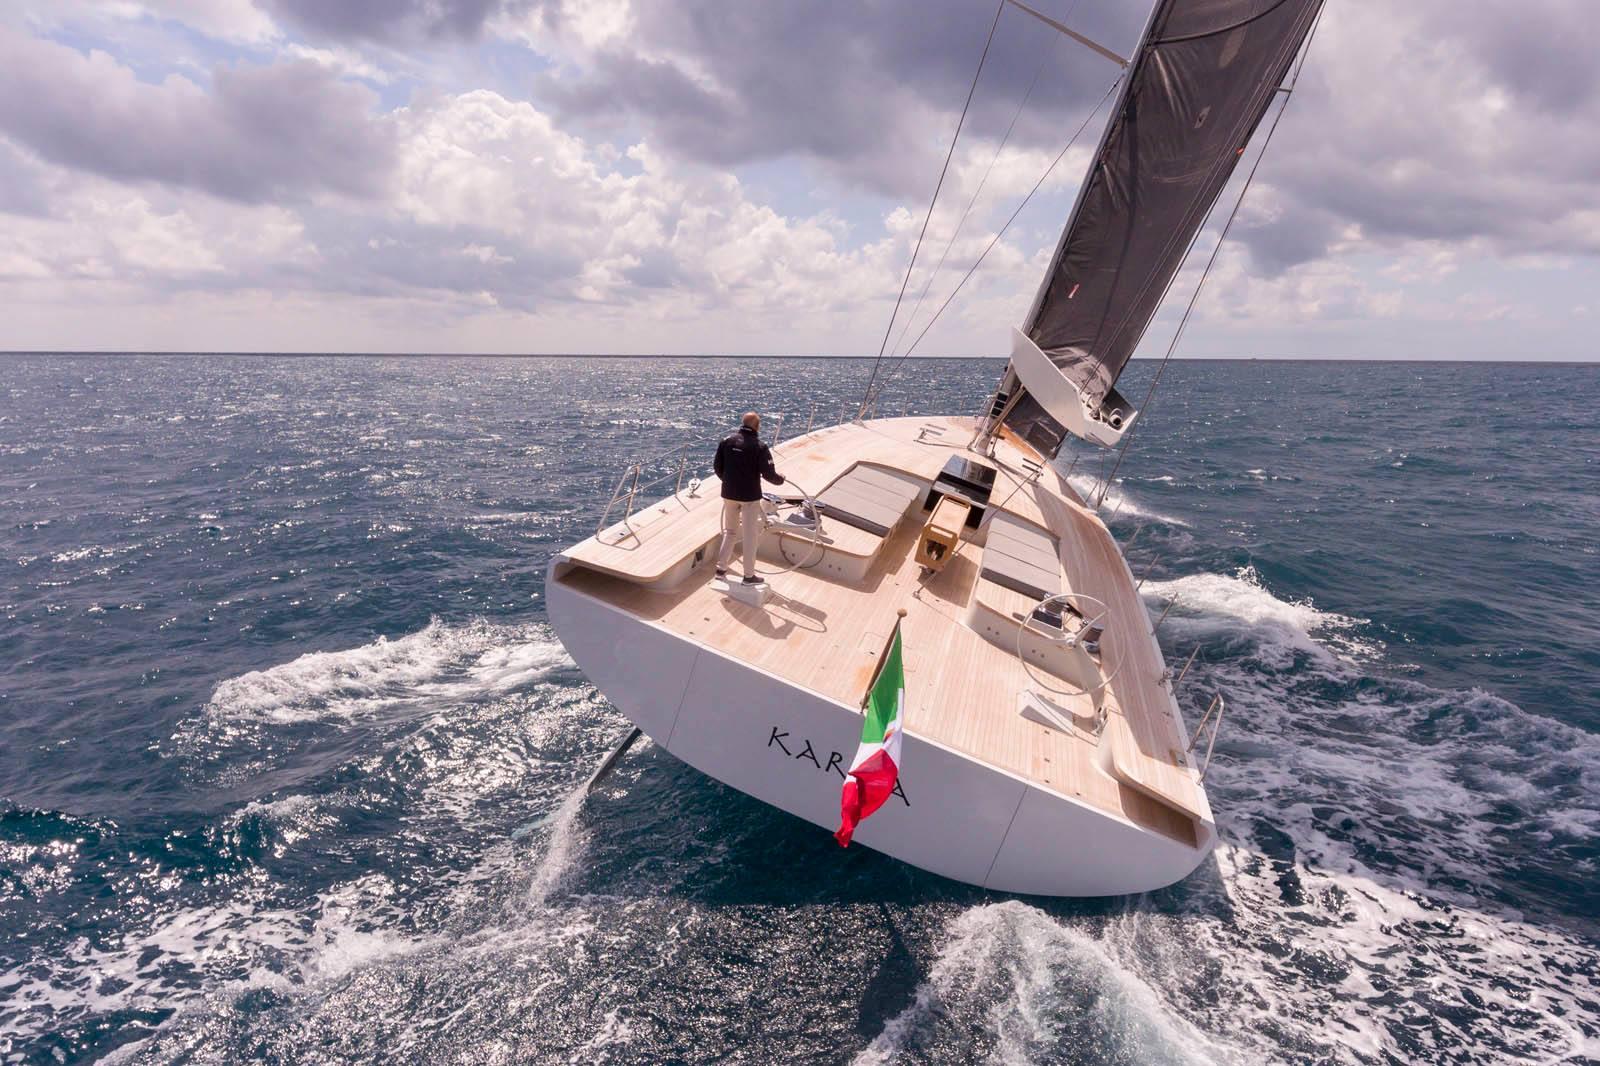 Karma, Best Sailing Yacht at The International Yacht & Aviation Awards 2020 held in Capri, Italy